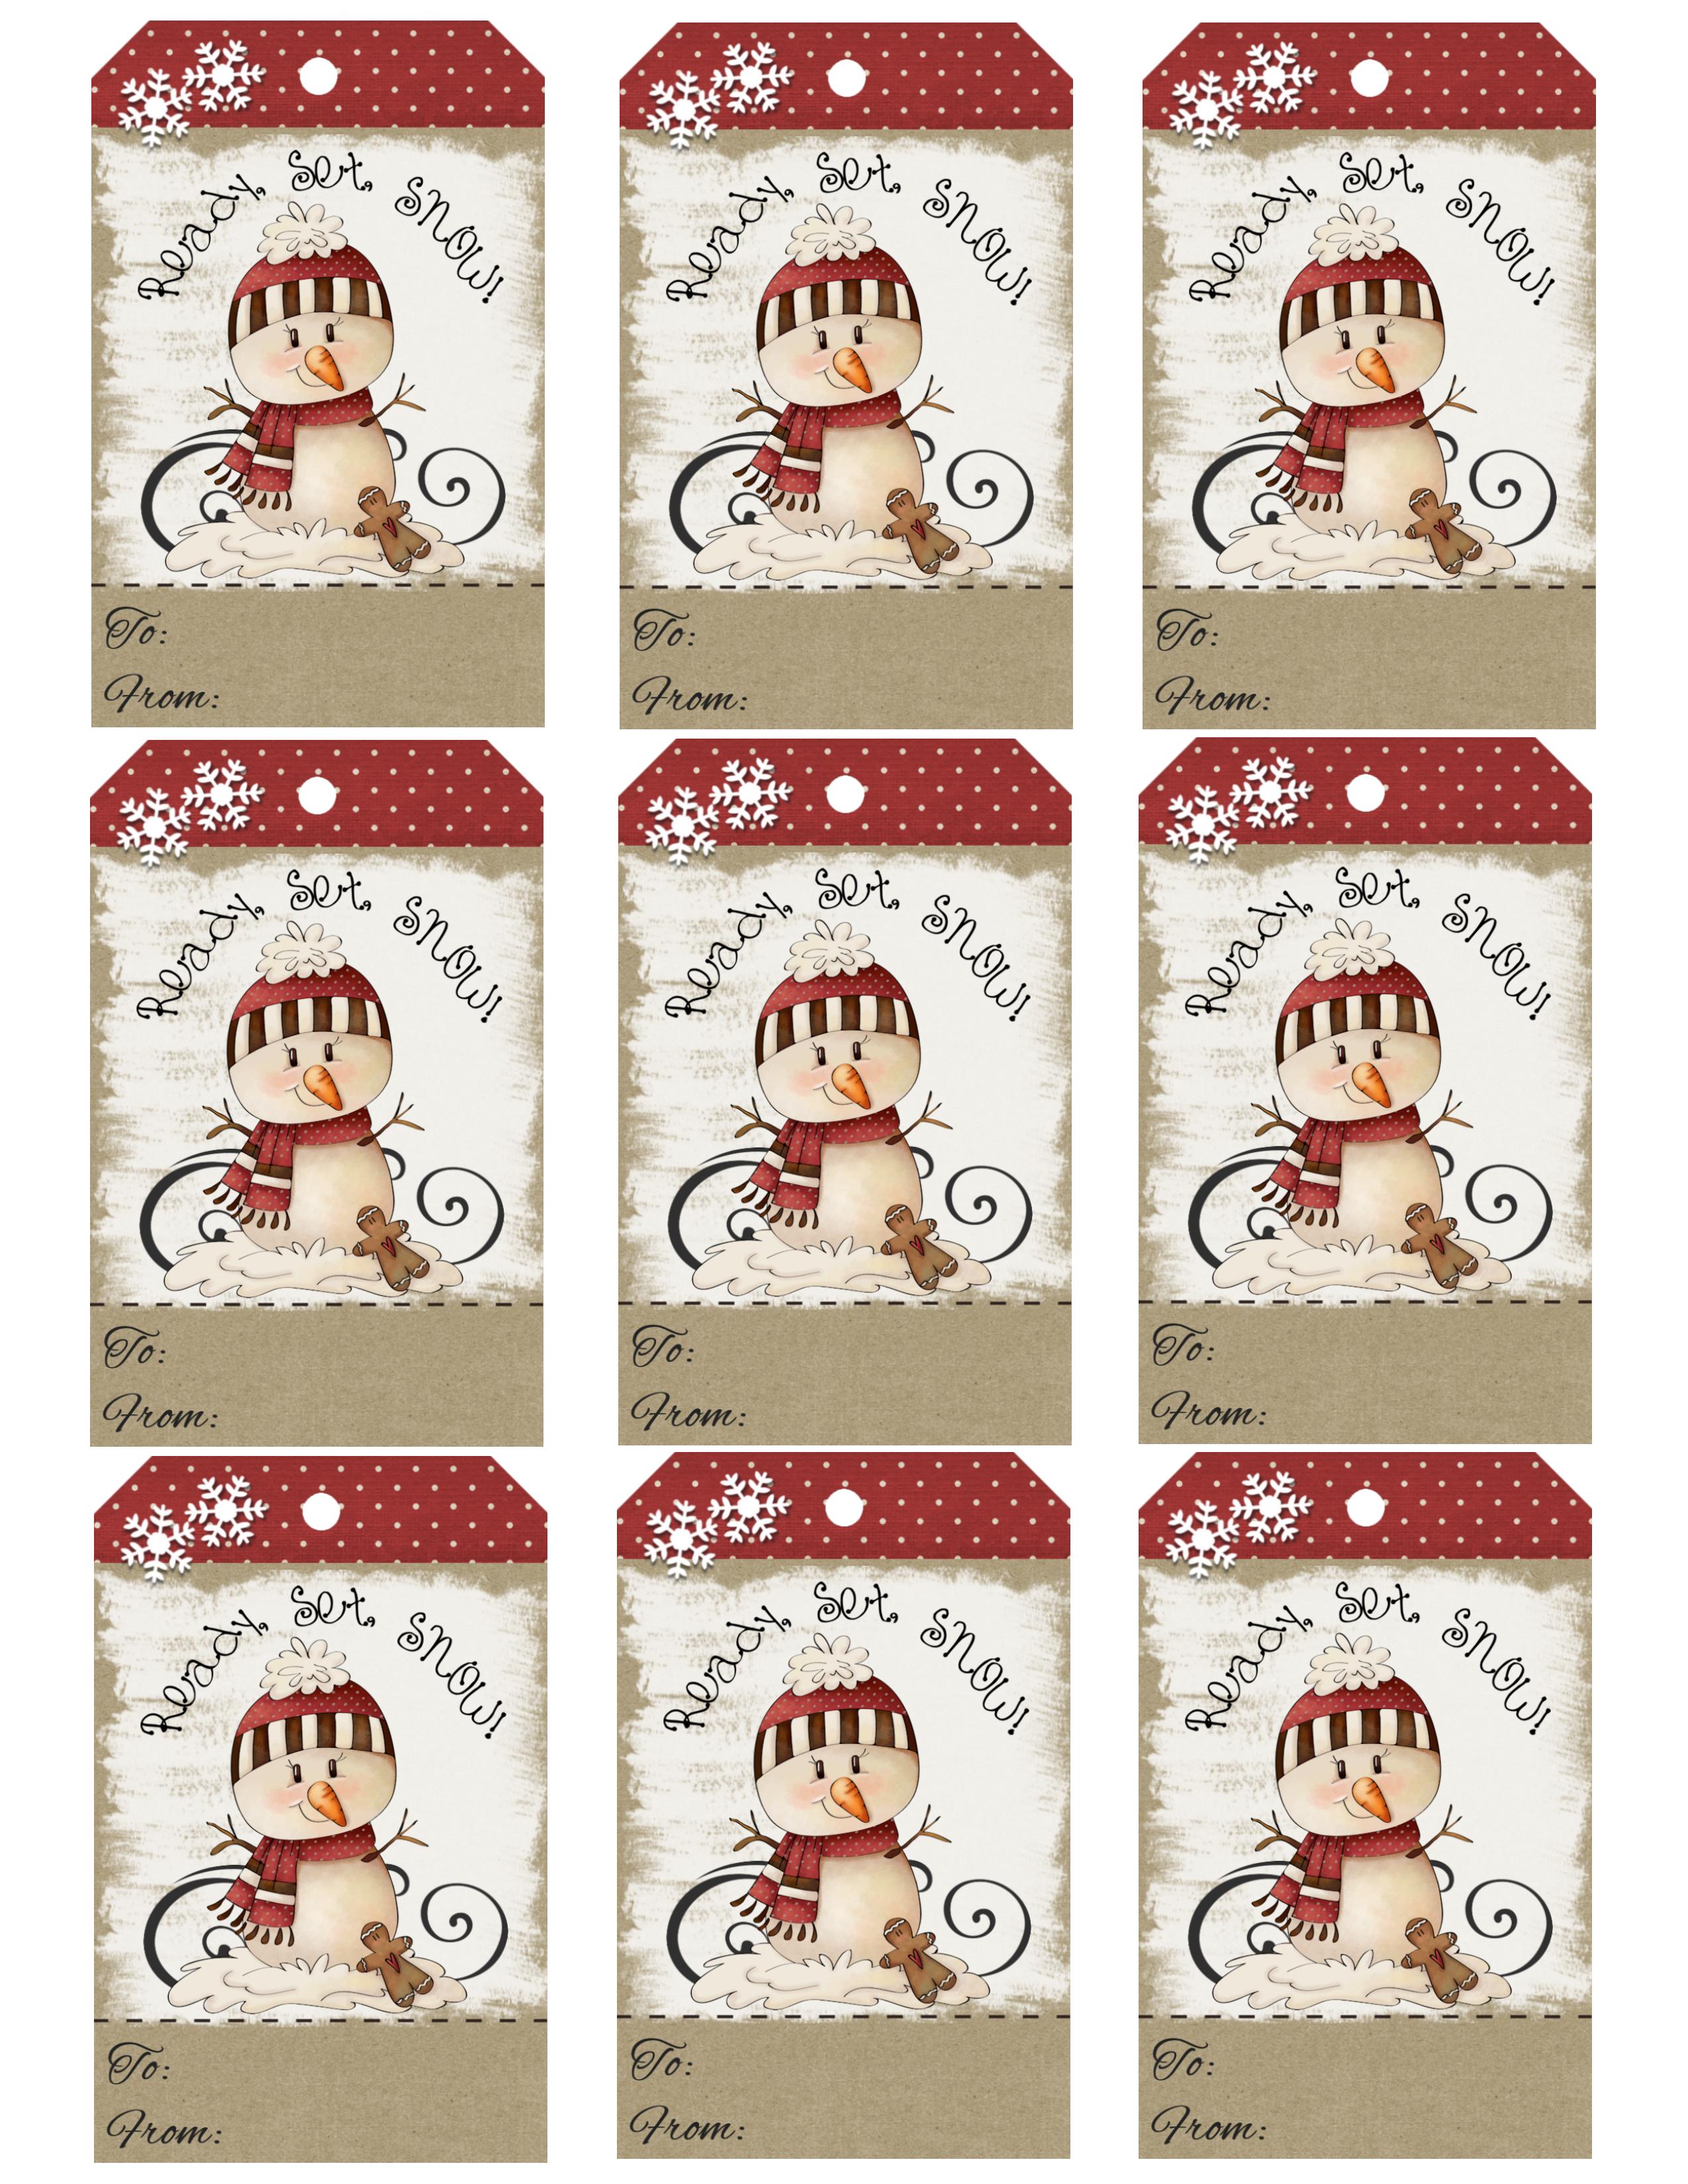 Diy free printable cartoon christmas tags free printable cookies for santa box negle Choice Image